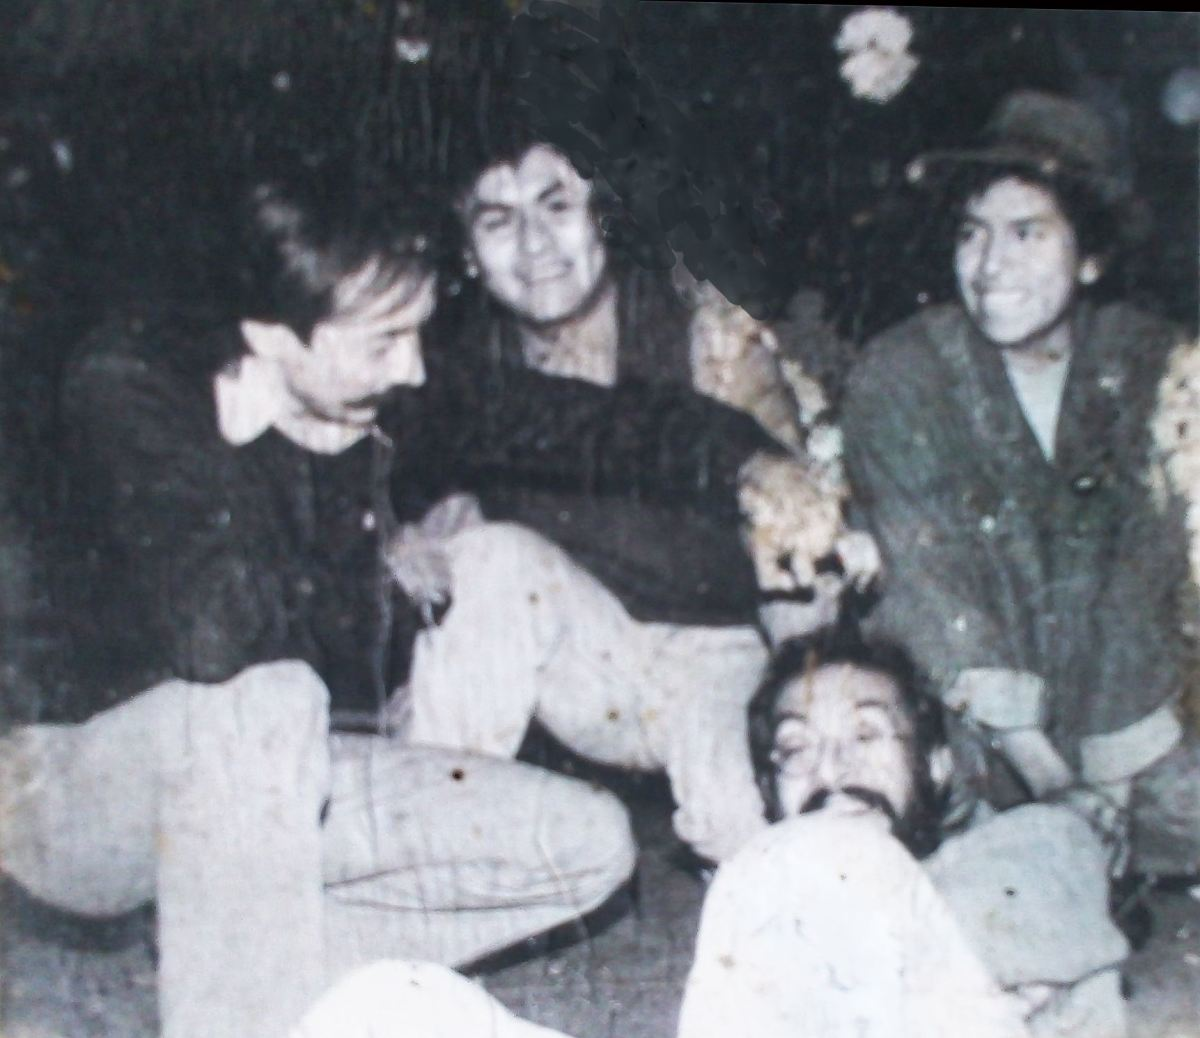 Ricardo Huet, Hugo Montero, Ruben Sadot, Augustine? photo taken by Gerardo Amor